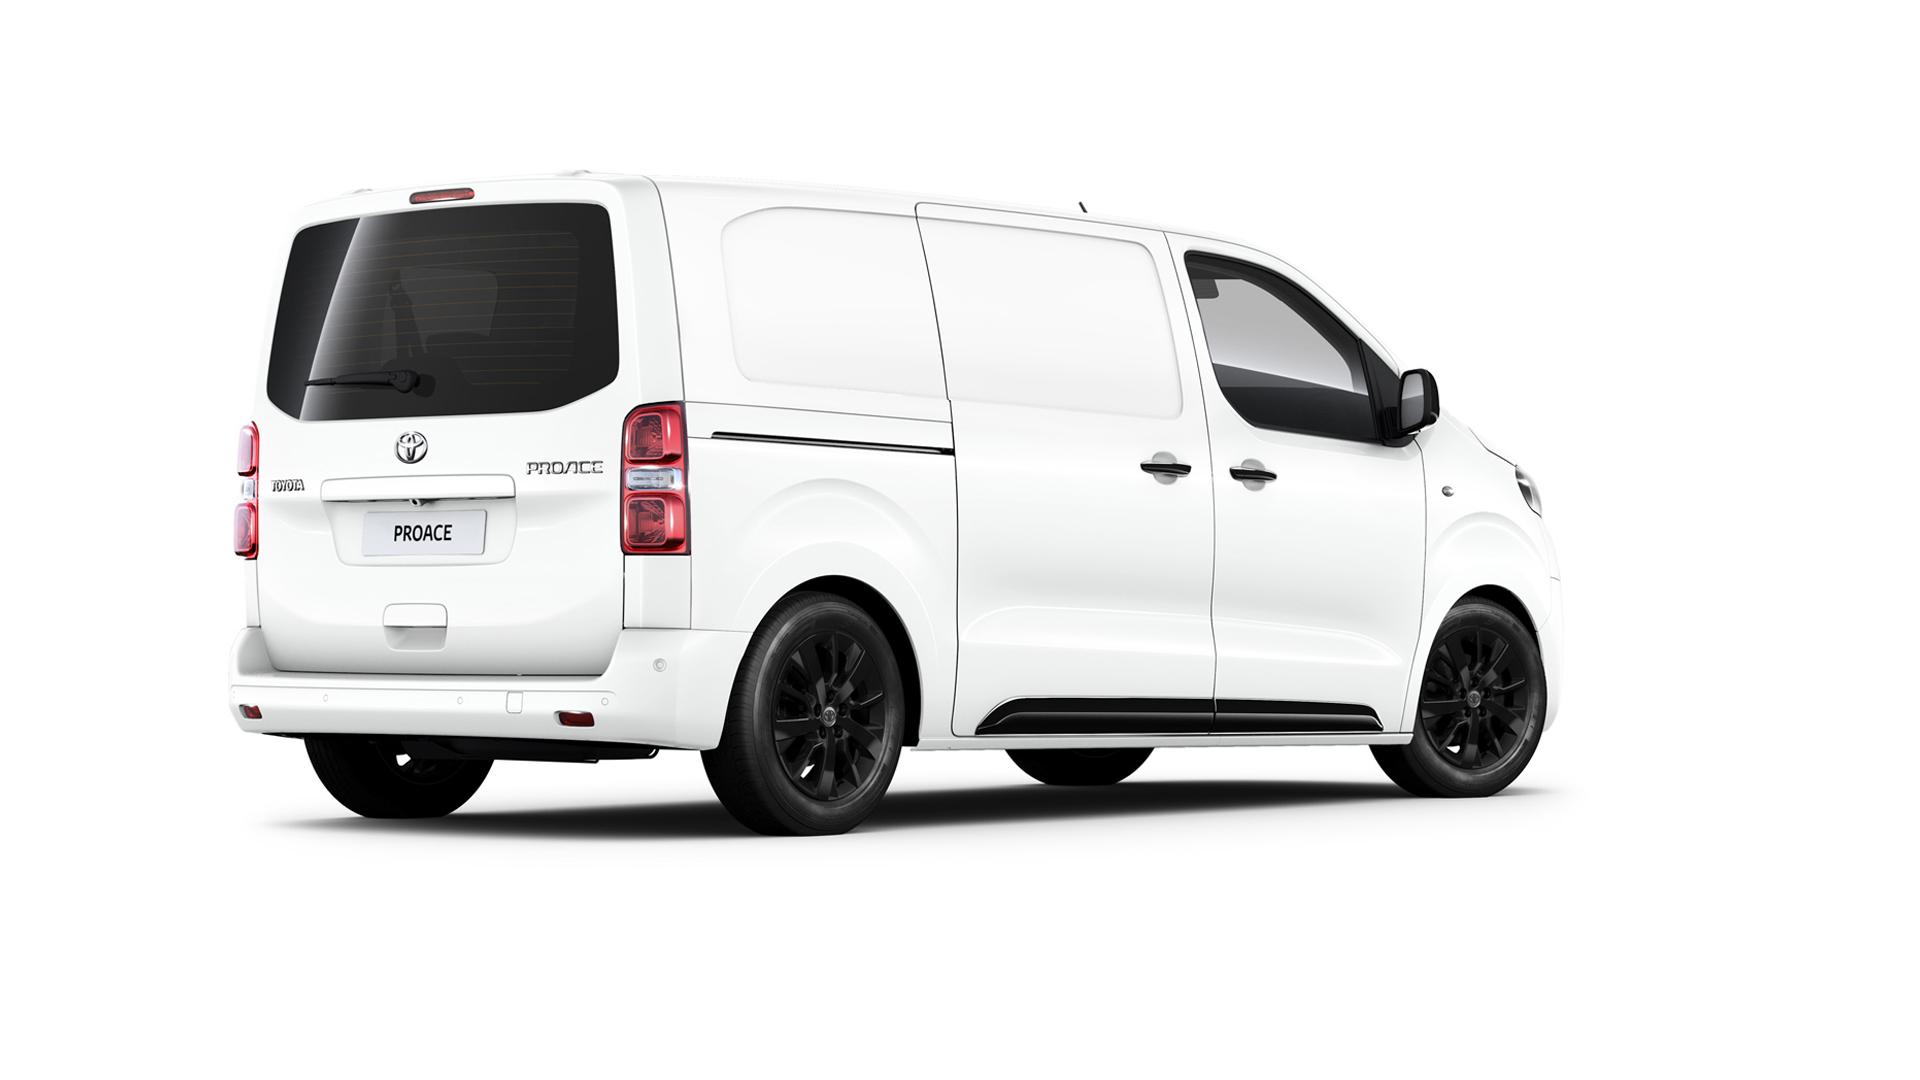 Toyota Ticari Arac Pazarina Professional Ile Giriyor